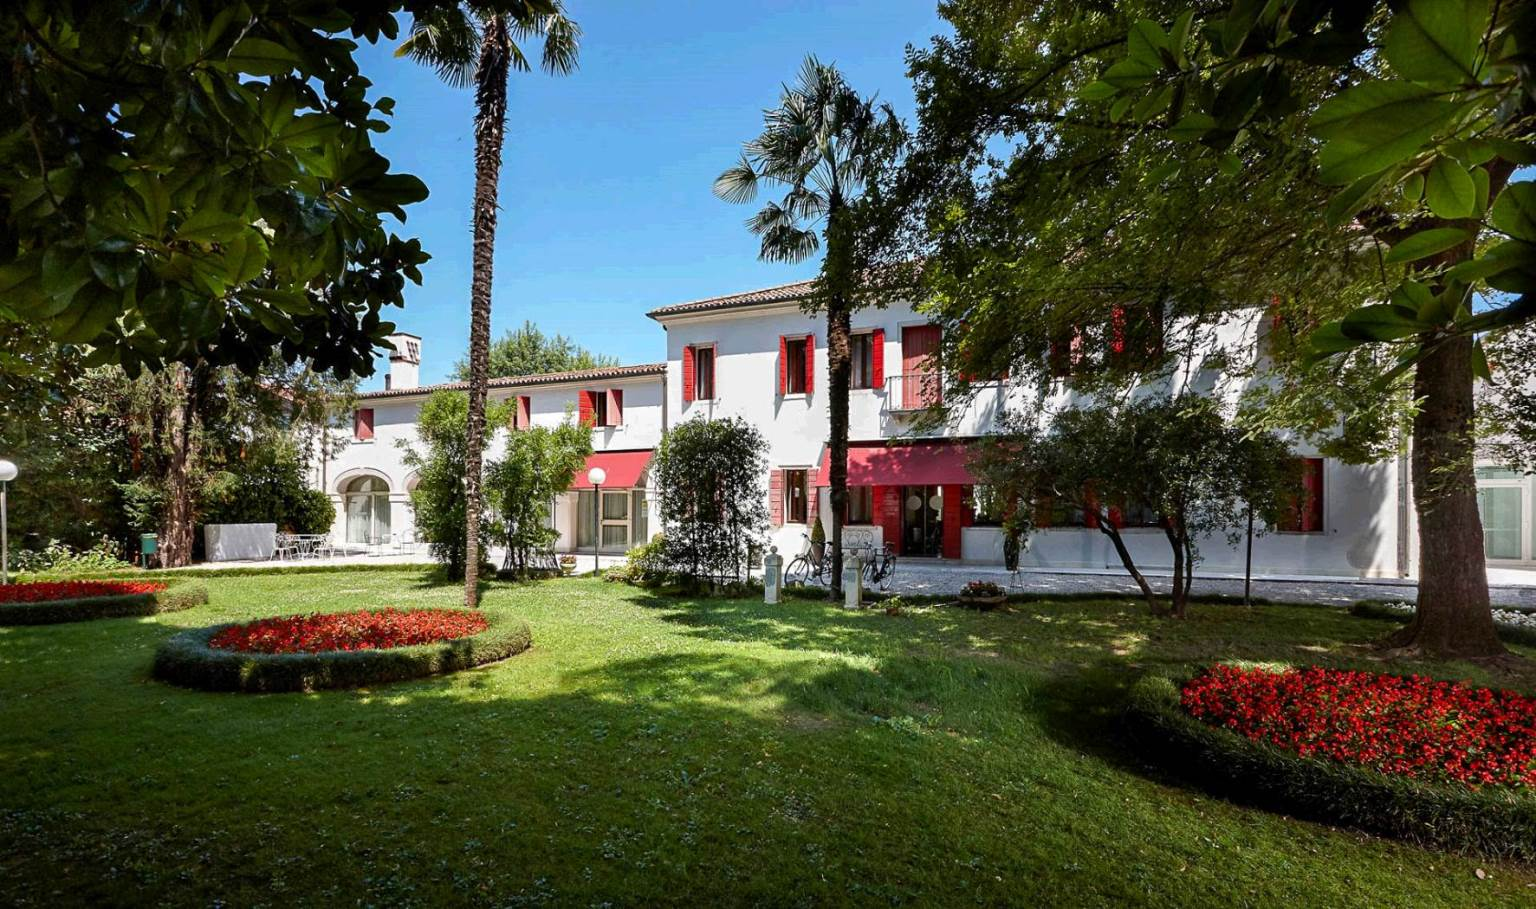 Hotel Villa Patriarca Mirano Venezia Veneto  allhotelit